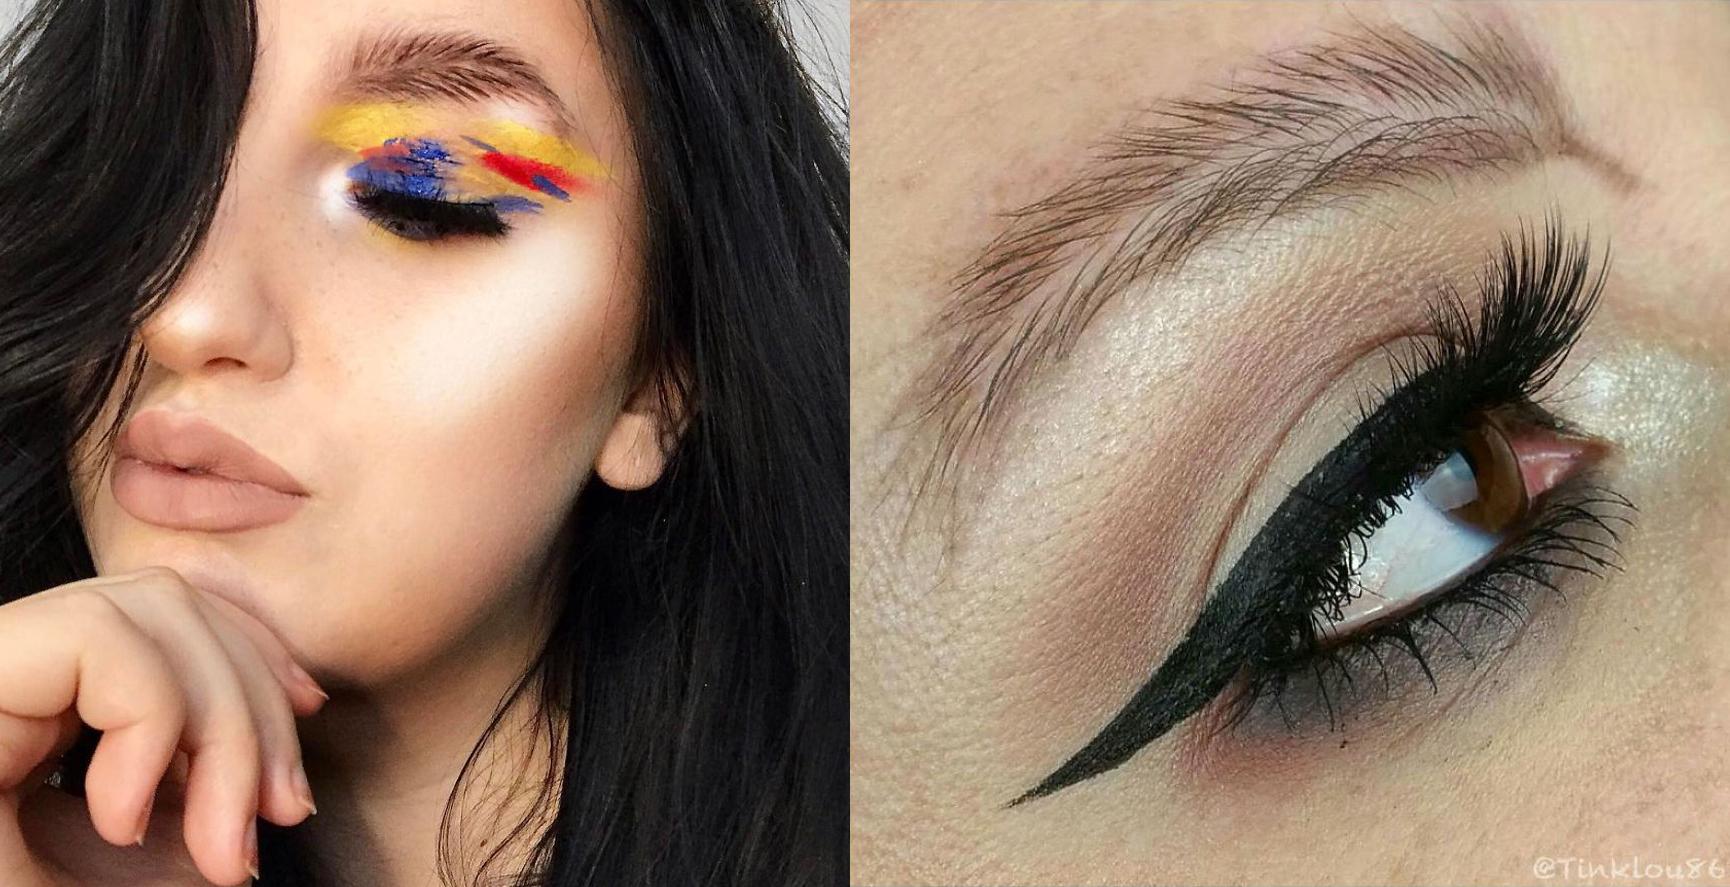 'Cejas pluma': la broma de la moda que internet se tomó en serio